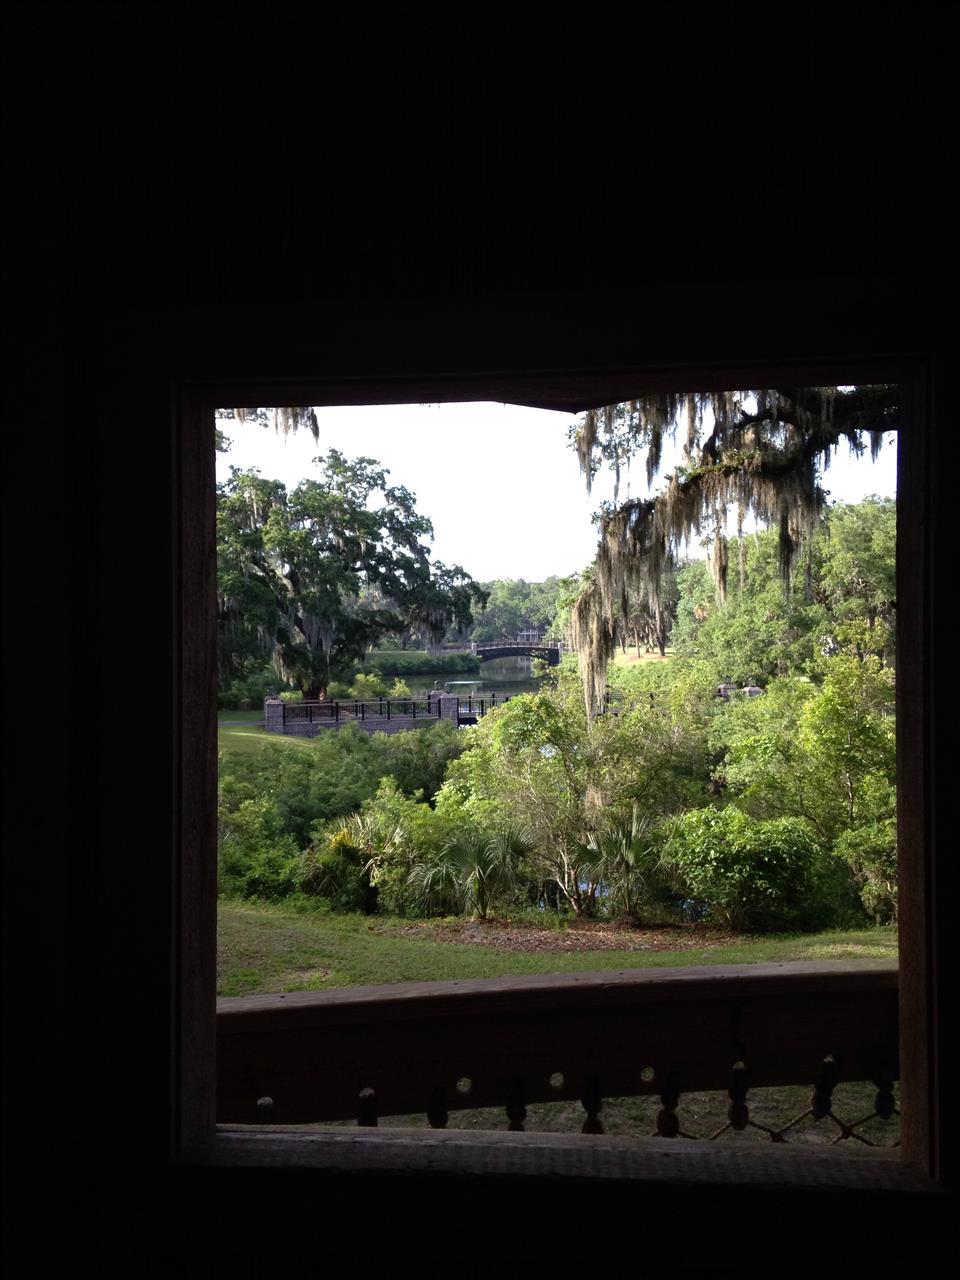 Palmetto Bluff Bluffton/HHI SC, Peeking through the window of the treehouse